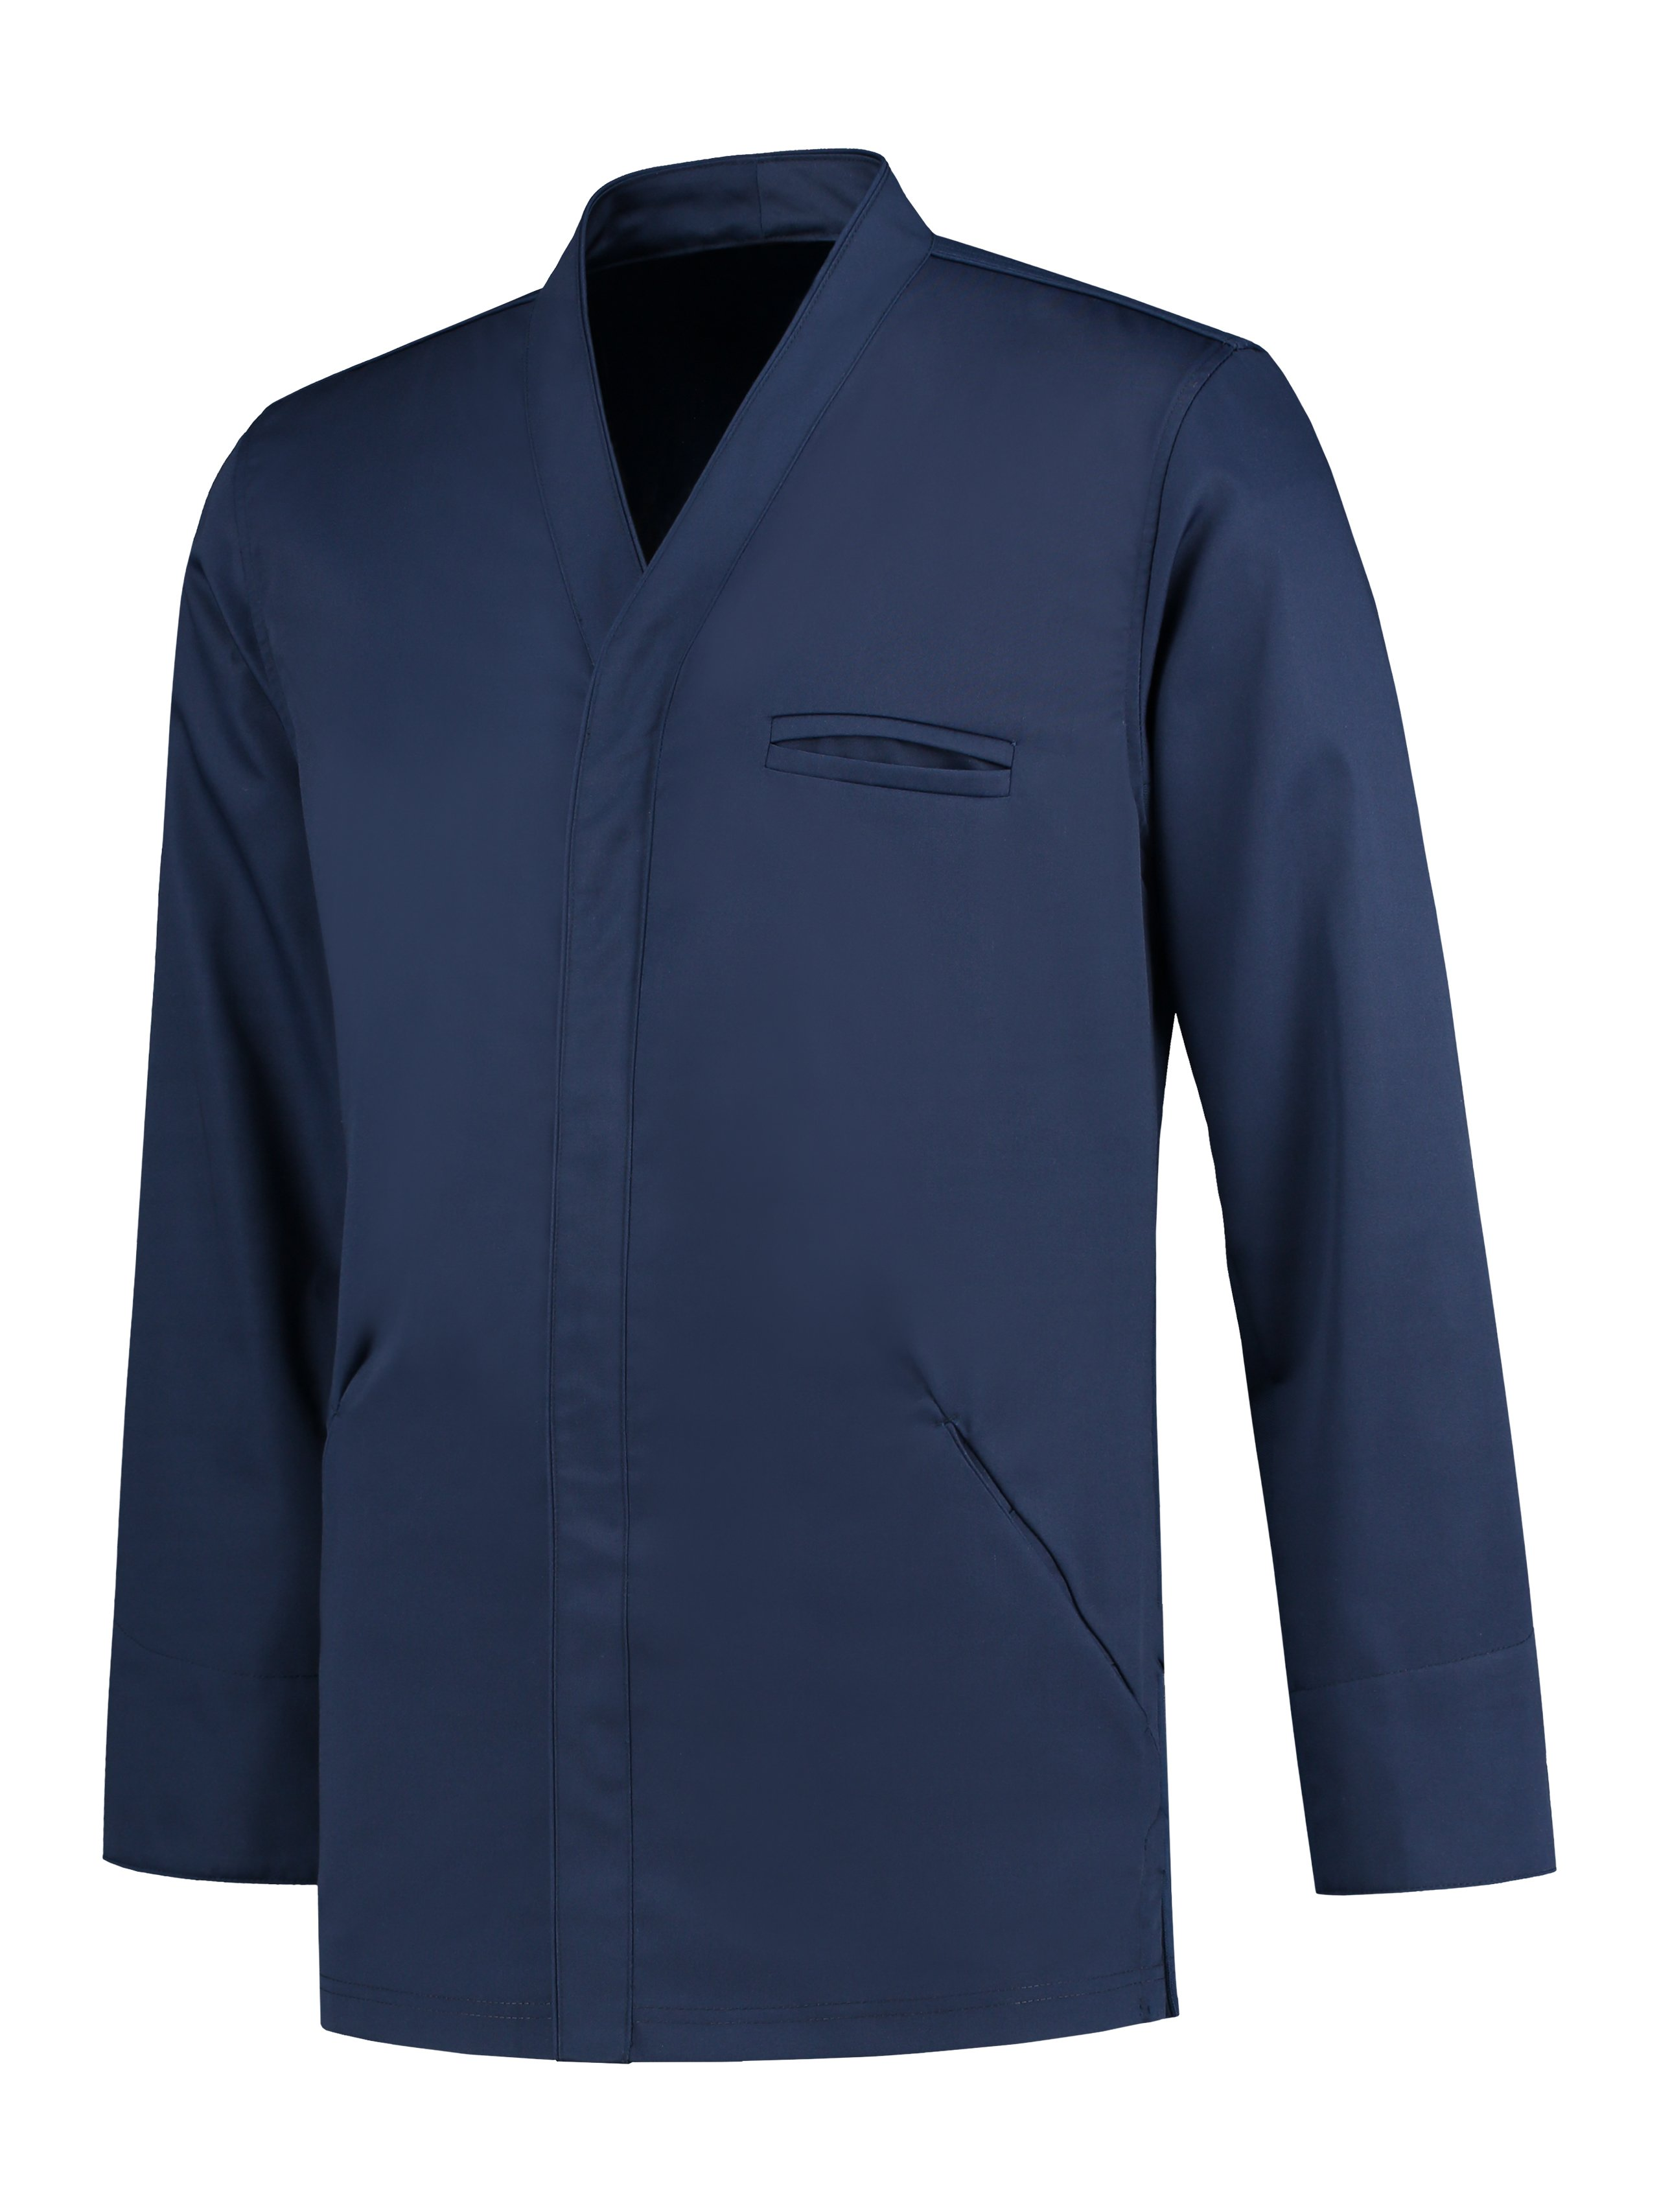 Chef Jacket Andreas Patriot Blue